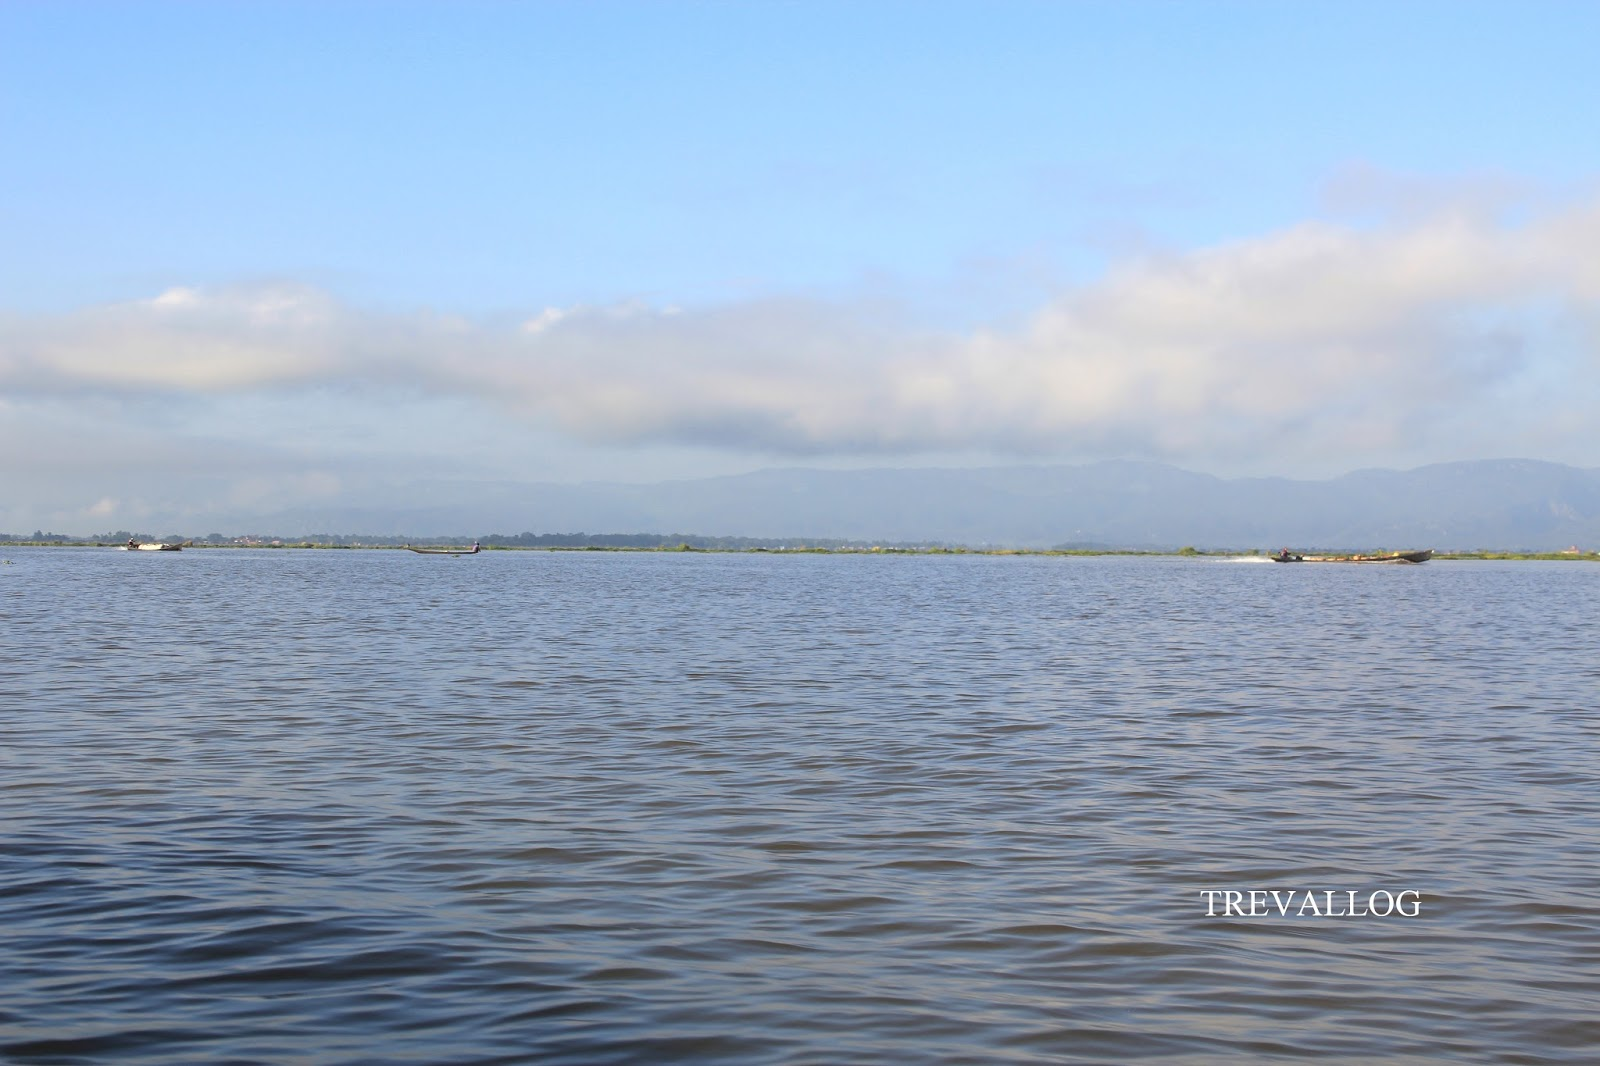 Sky, mountain and sea in Inle Lake, Myanmar